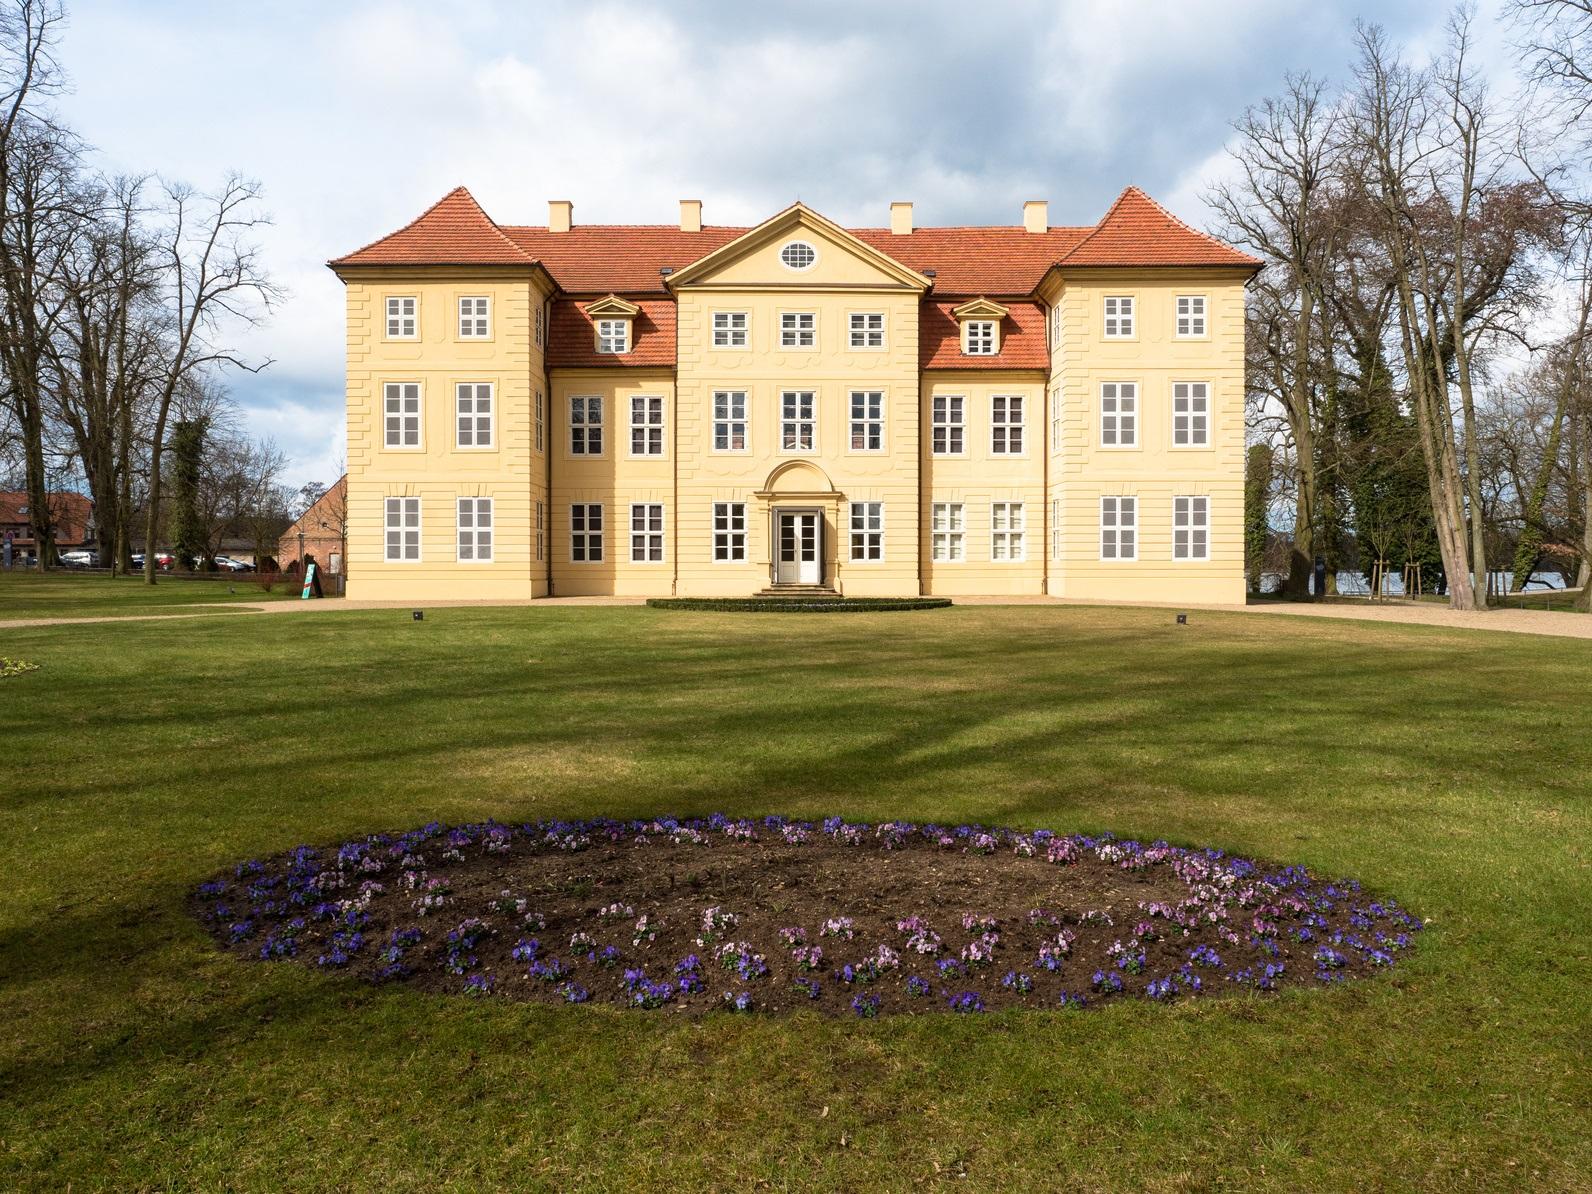 Schlossinsel Mirow